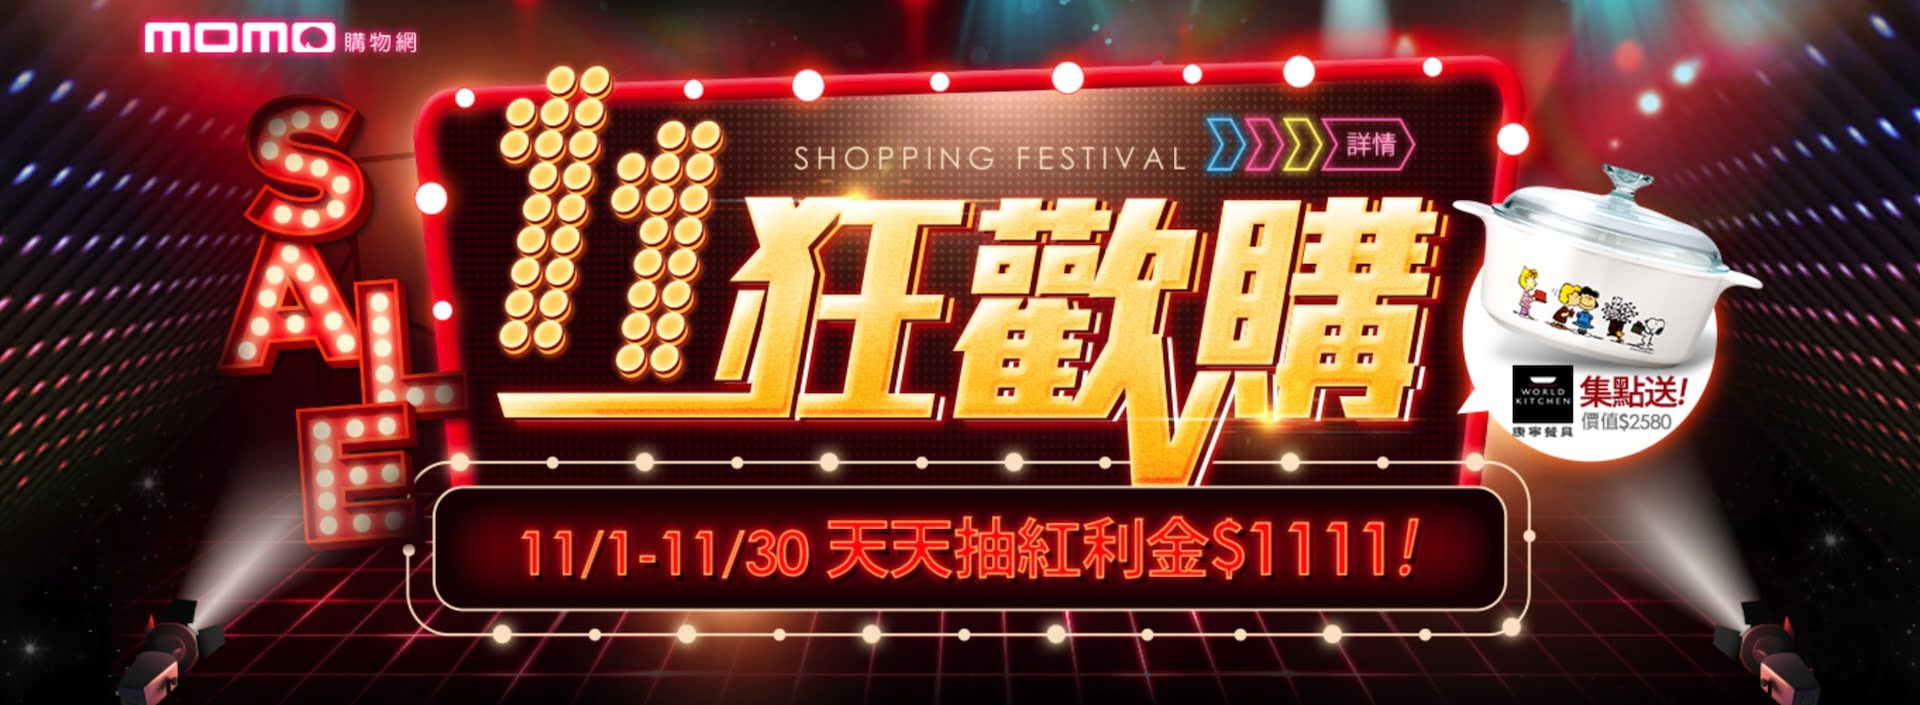 Momo Shopping Festival 201711 MOMO購物攻略/11 月狂歡購促銷活動點數如何快速收集?